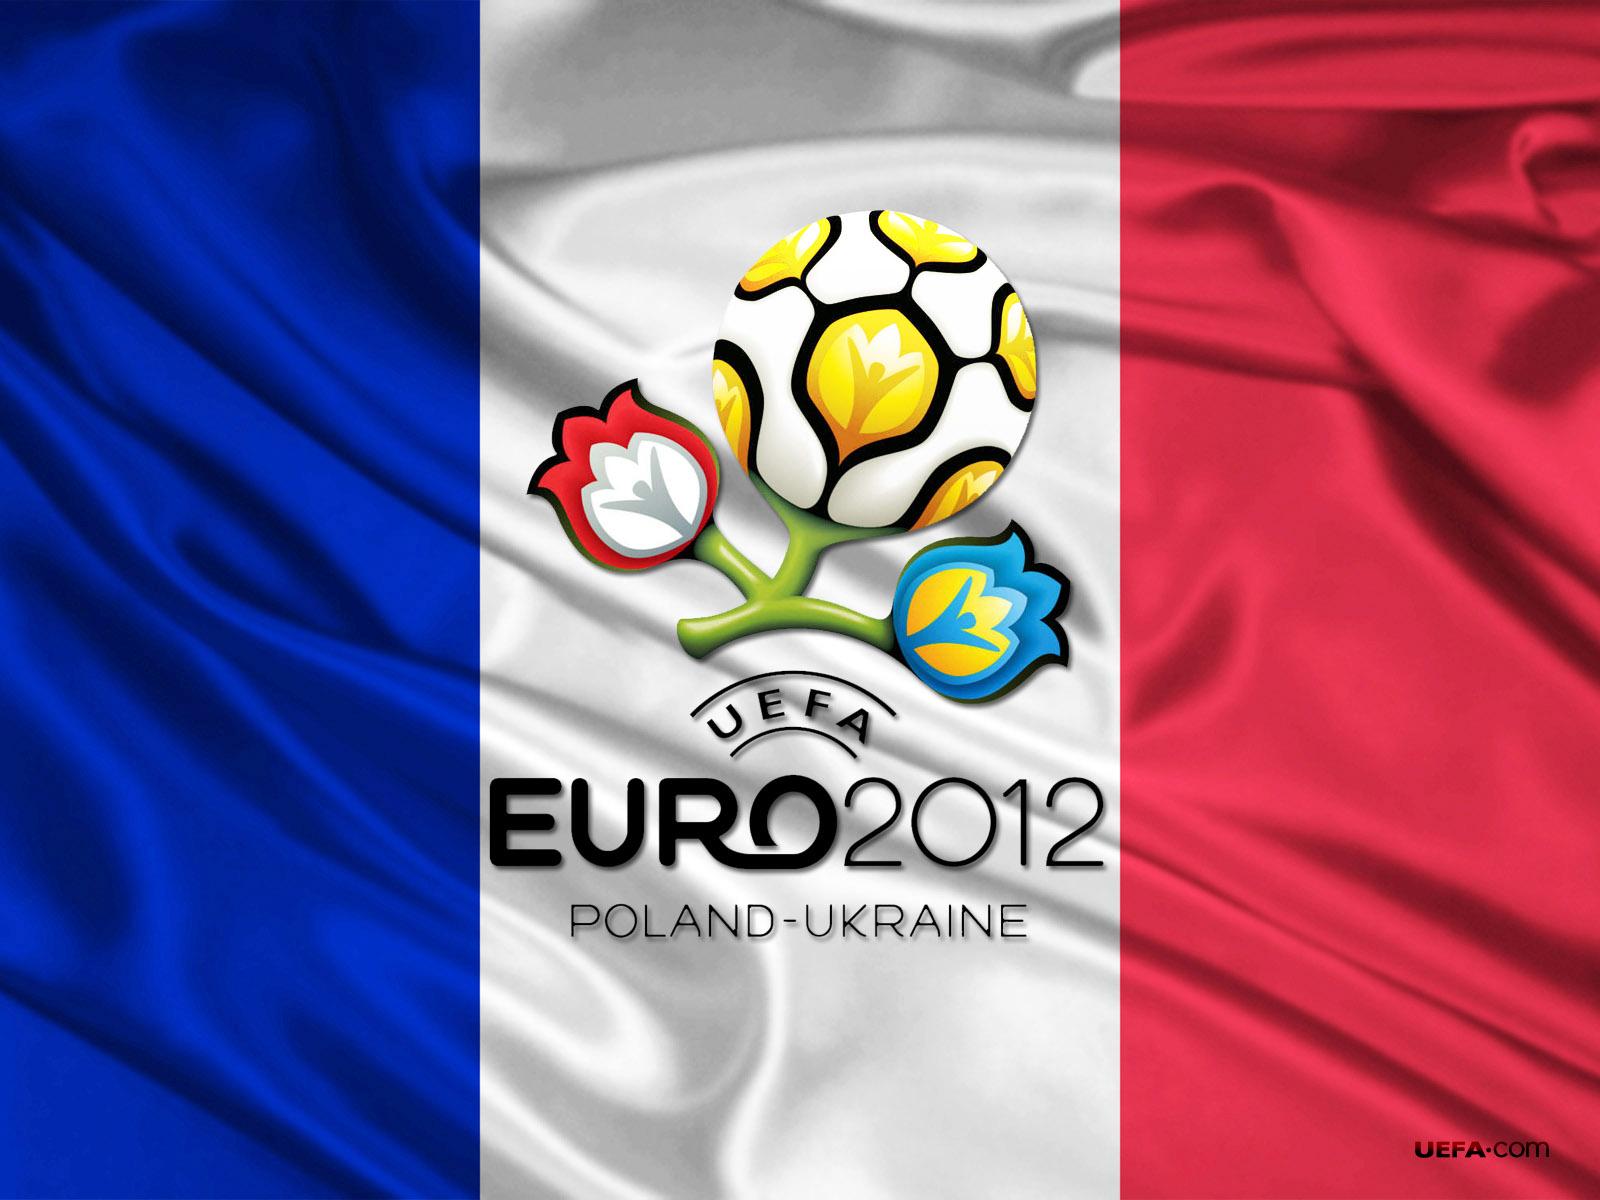 http://2.bp.blogspot.com/-VBKWY2gYGrg/T-hNNqbYAGI/AAAAAAAACQs/uXUY72SOs8U/s1600/Euro_2012_France_Flag_HD_Desktop_Wallpaper-HidefWall.Blogspot.Com.jpg